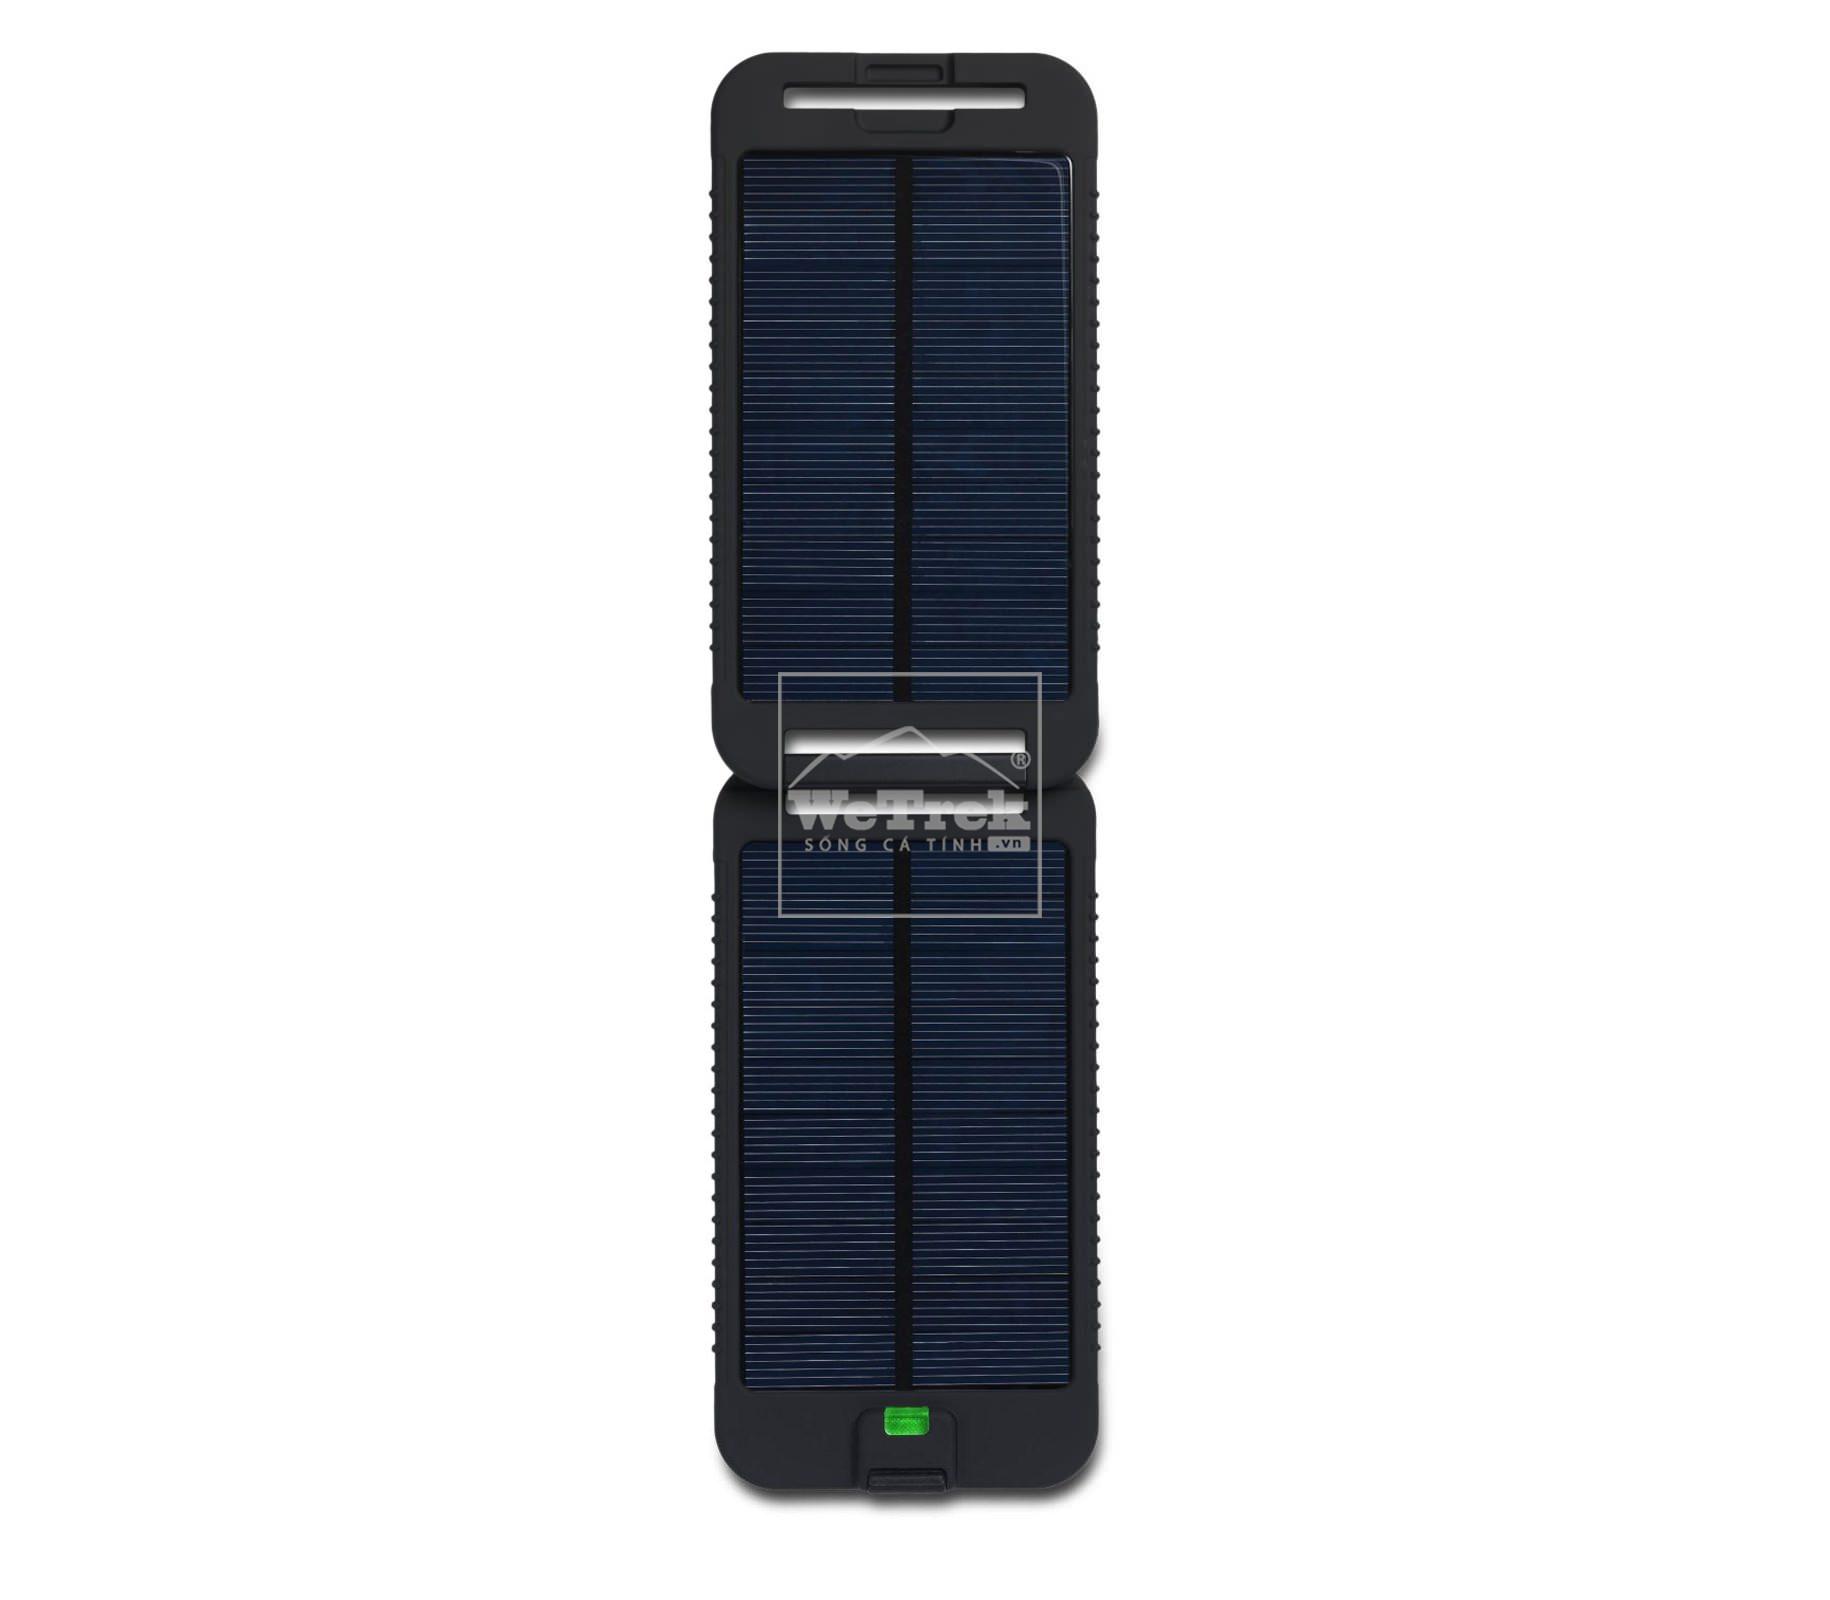 Bảng mạch năng lượng mặt trời tích hợp pin Powertraveller Solarmonkey Adventurer SMA003 - 5514